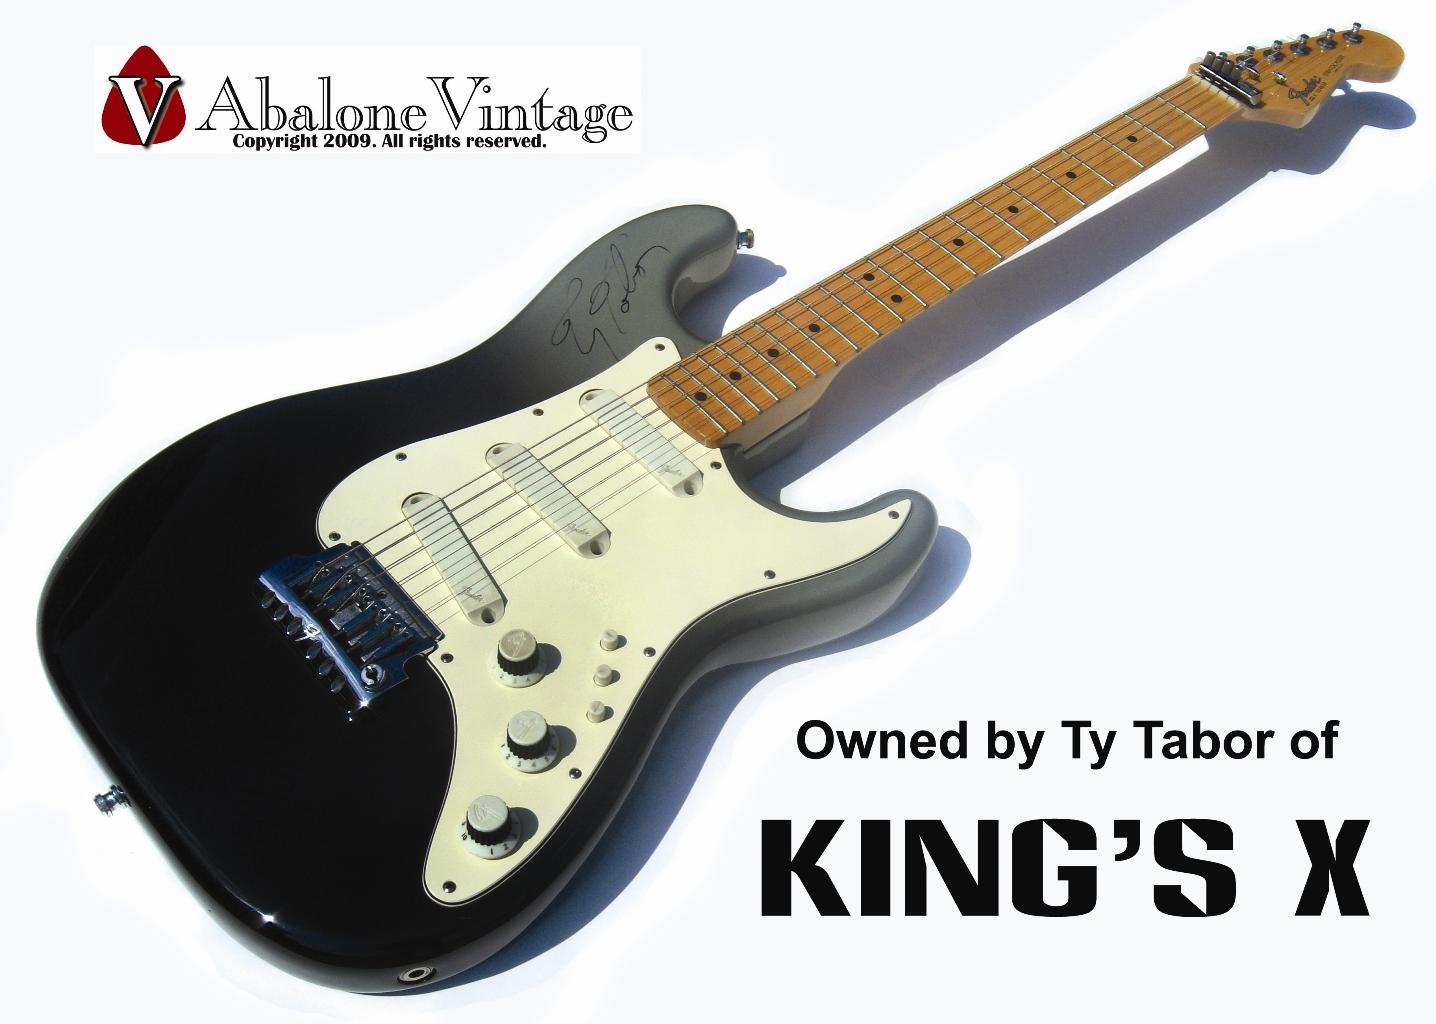 Ty Tabor Kings X King S X Fender Stratocaster Elite Zion